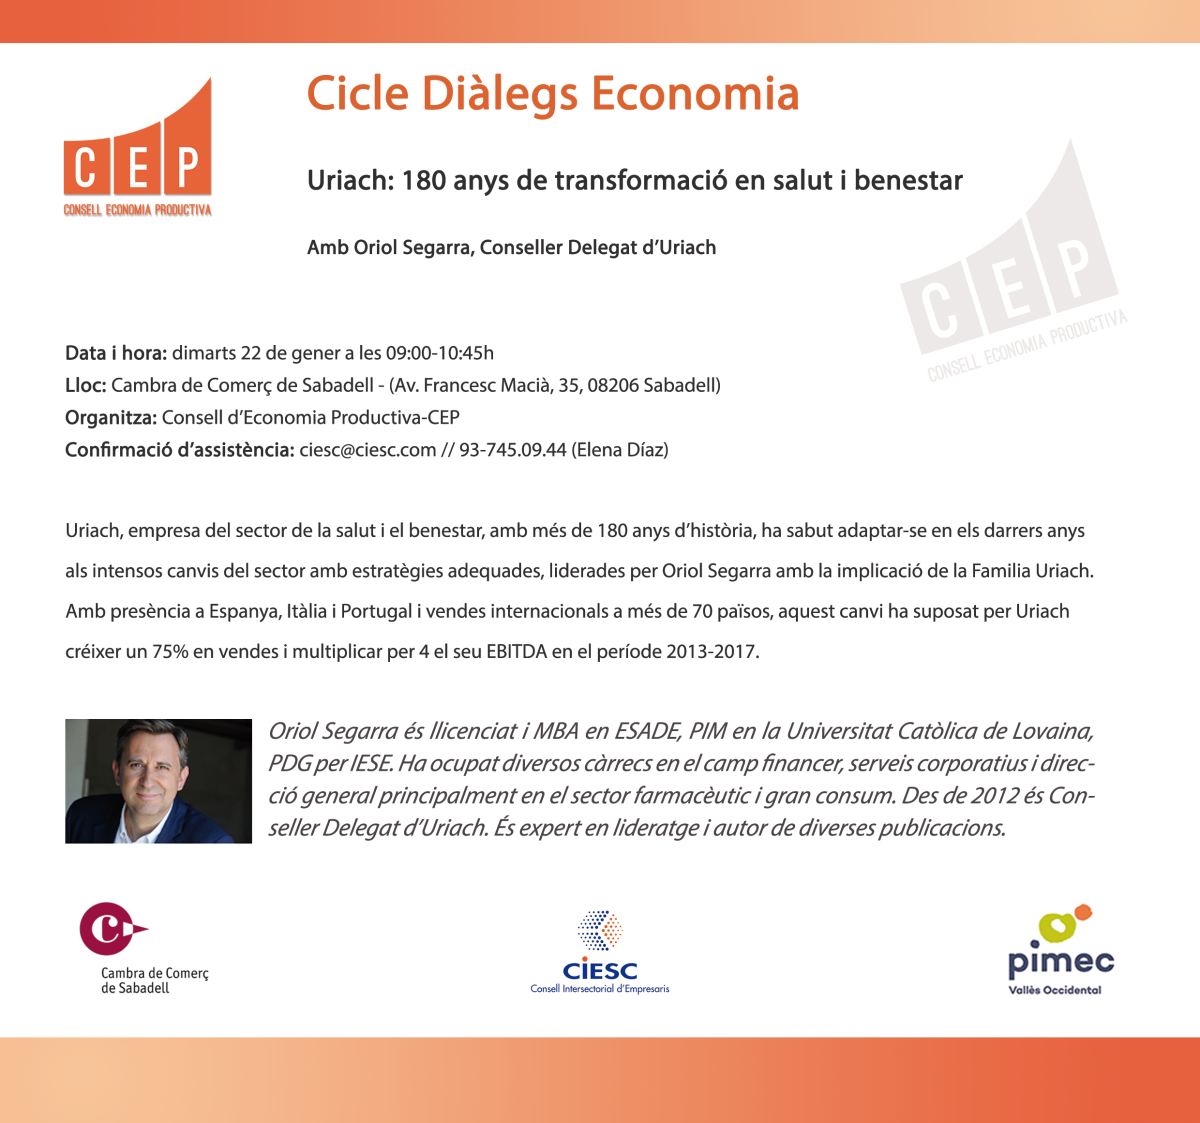 targetó_Diàlegs economia Uriach_Def